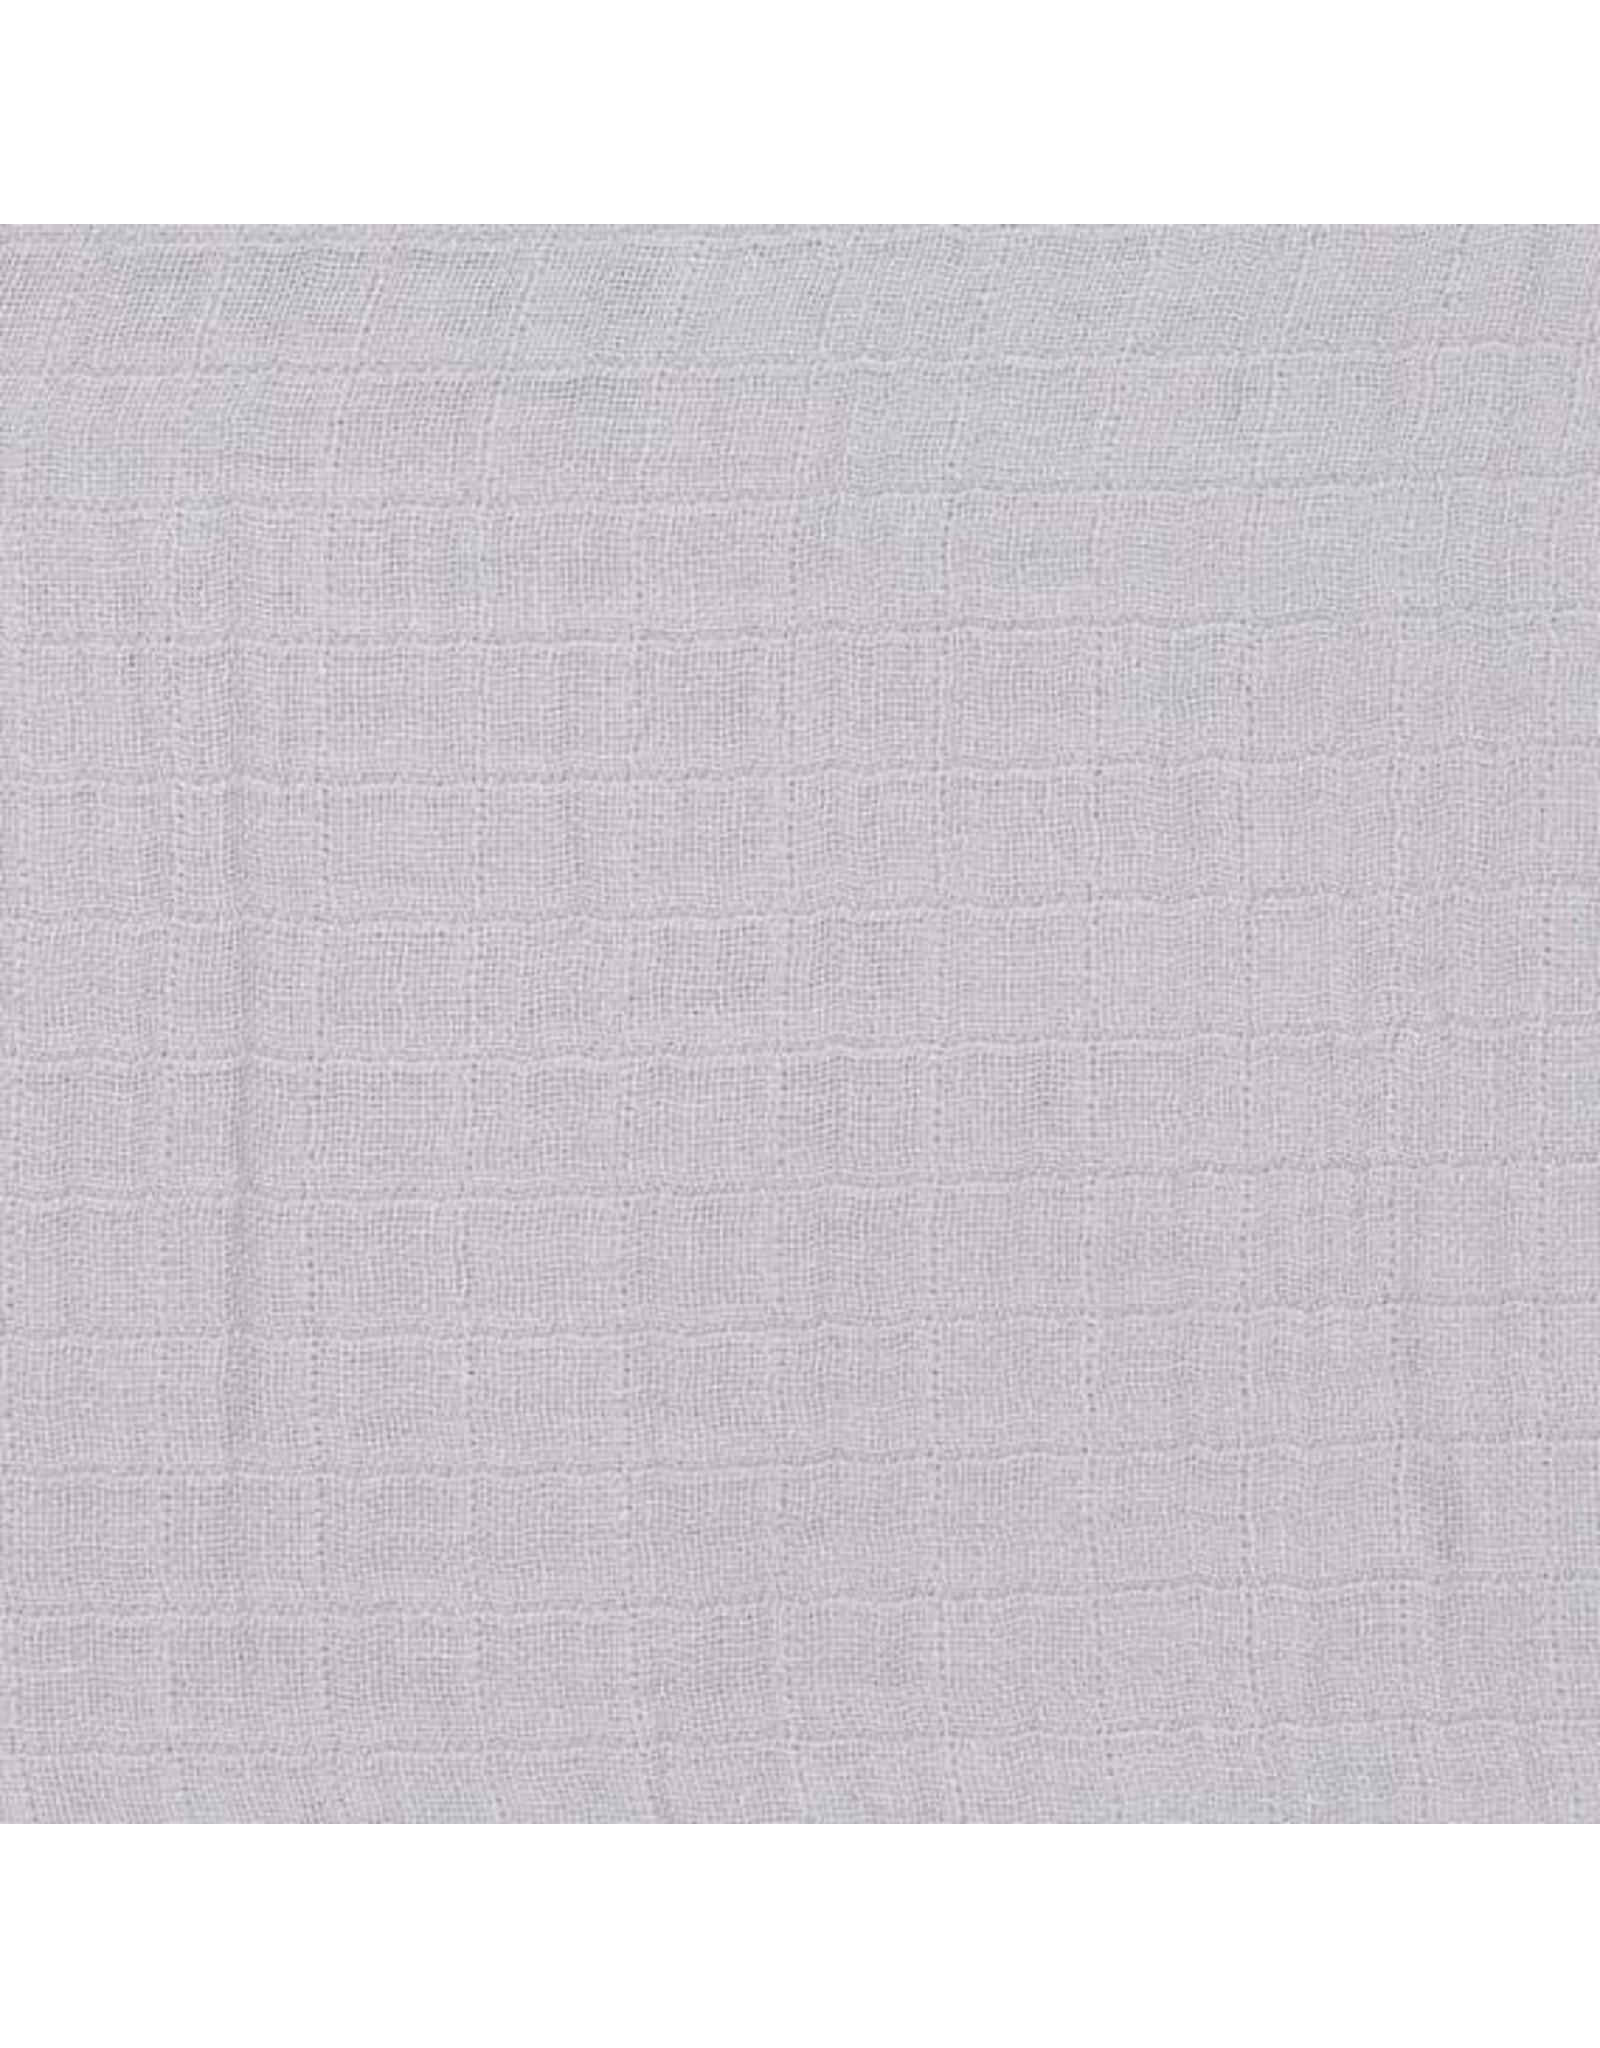 Lassig Lassig Swaddle & Burp Blanket L Adventure Dragonfly 85x85